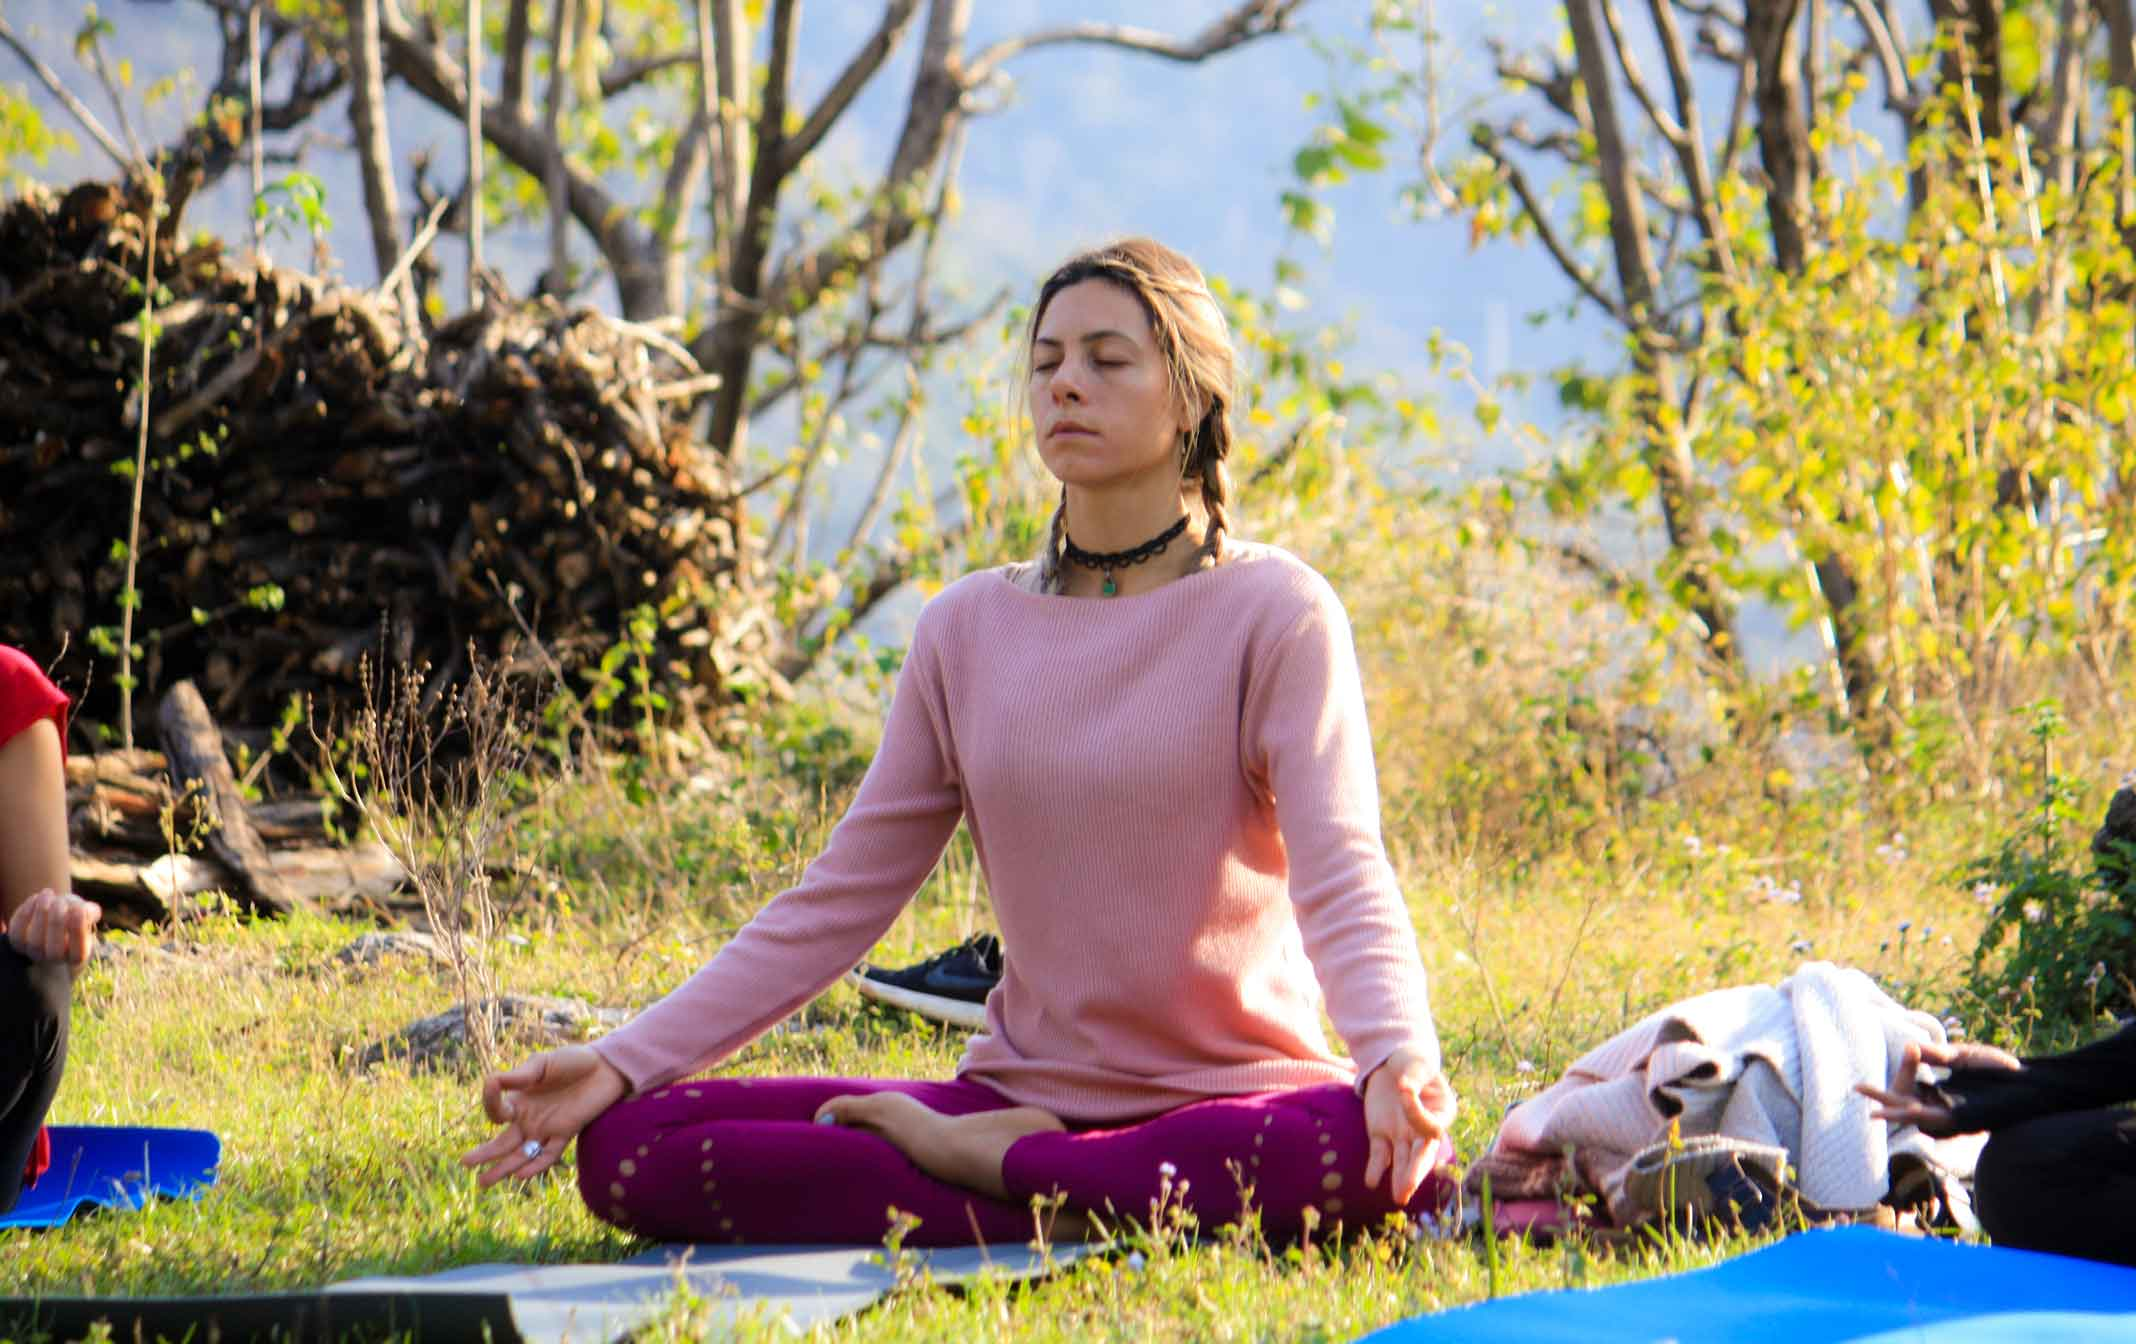 300 Hour Yoga Teacher Training in Rishikesh, India - 2019, Dehradun, Uttarakhand, India